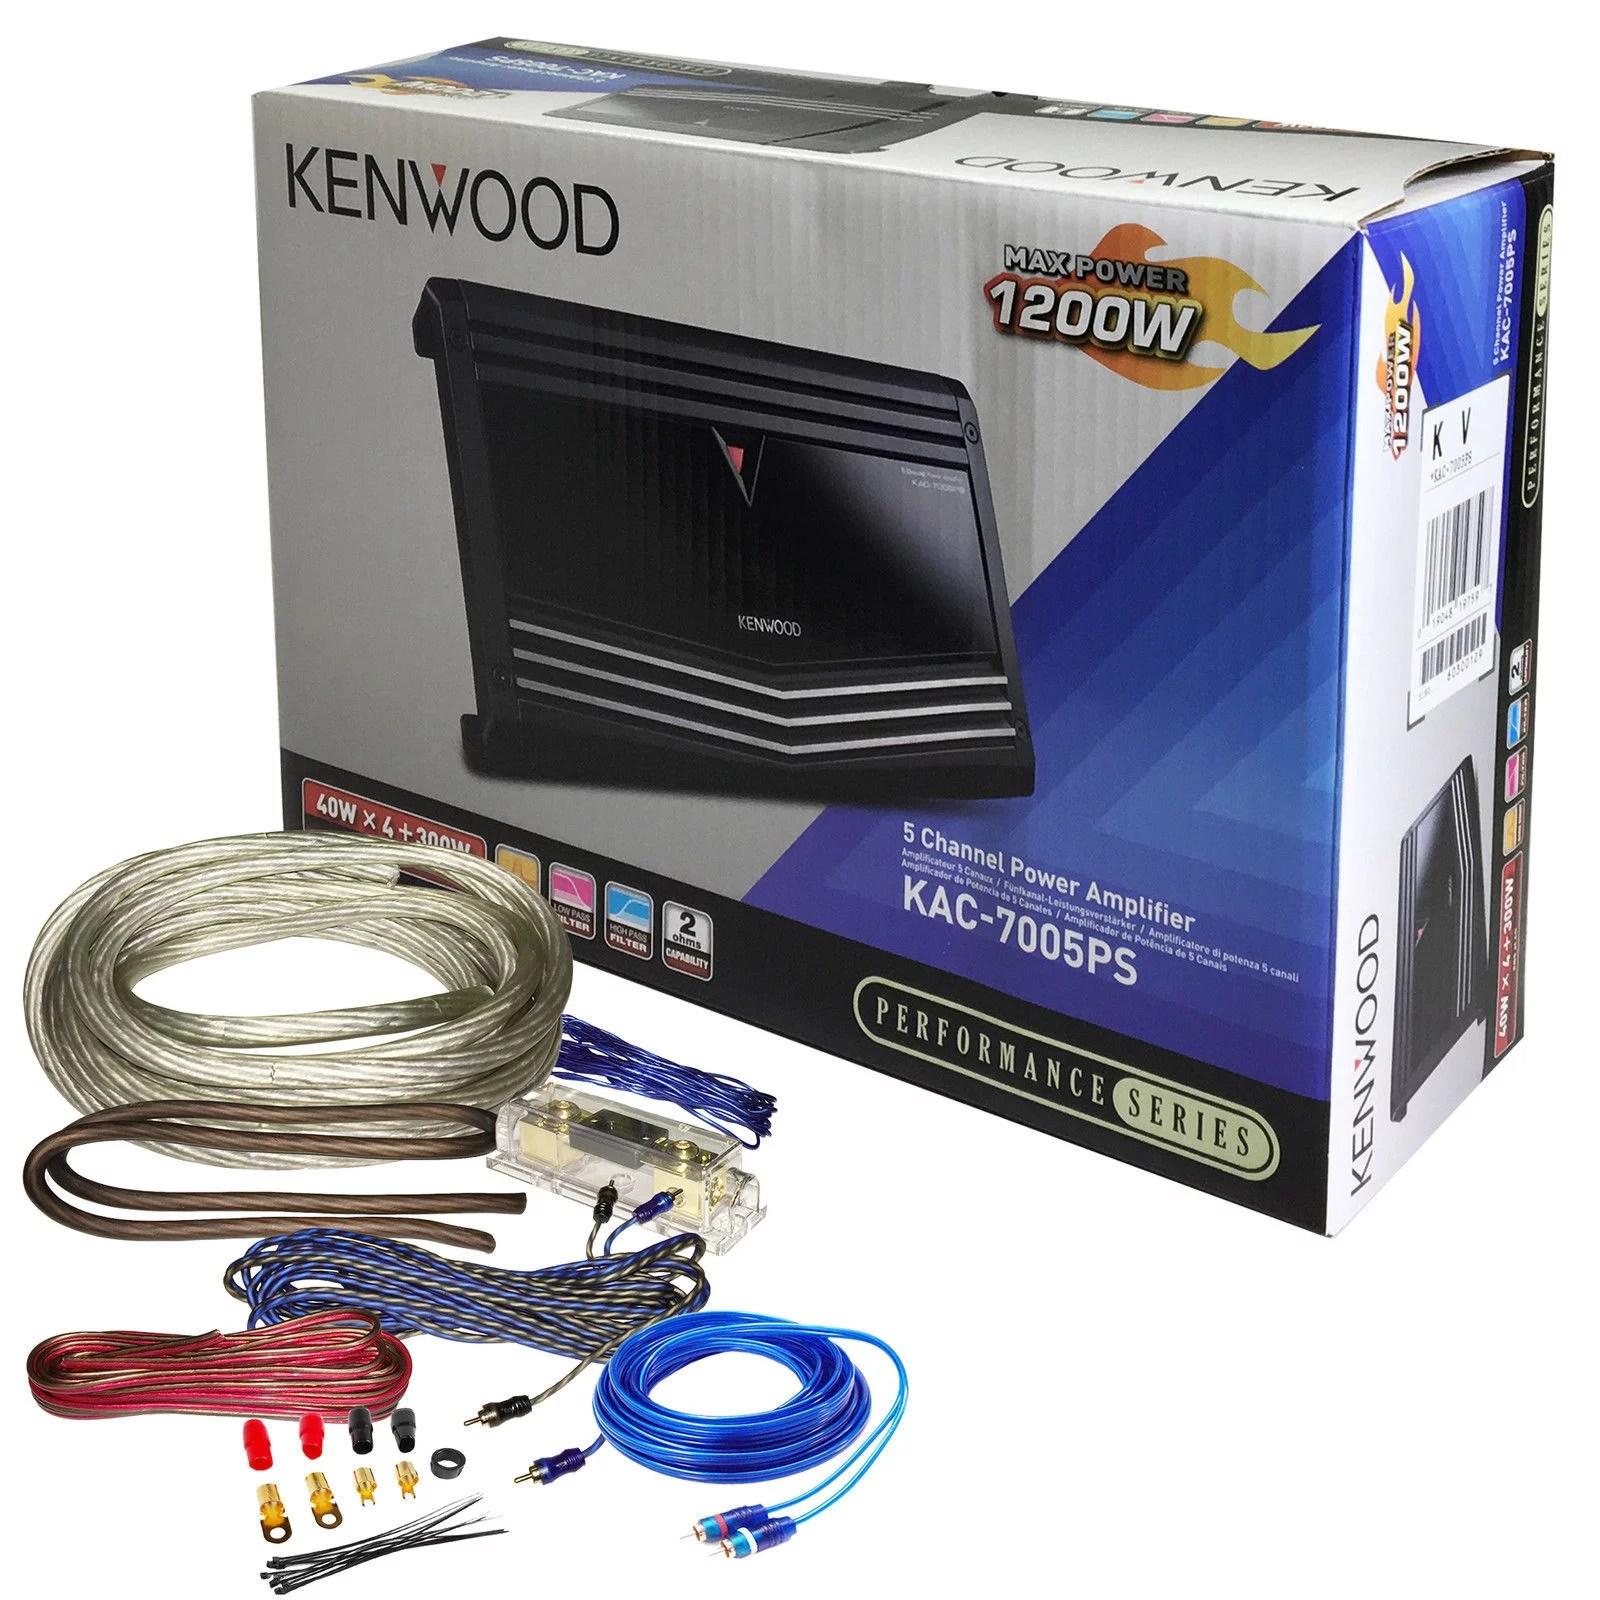 hight resolution of kenwood kac 7005ps 700w rms 5 channel car amplifier 1200w w wiringkenwood kac 7005ps 700w rms